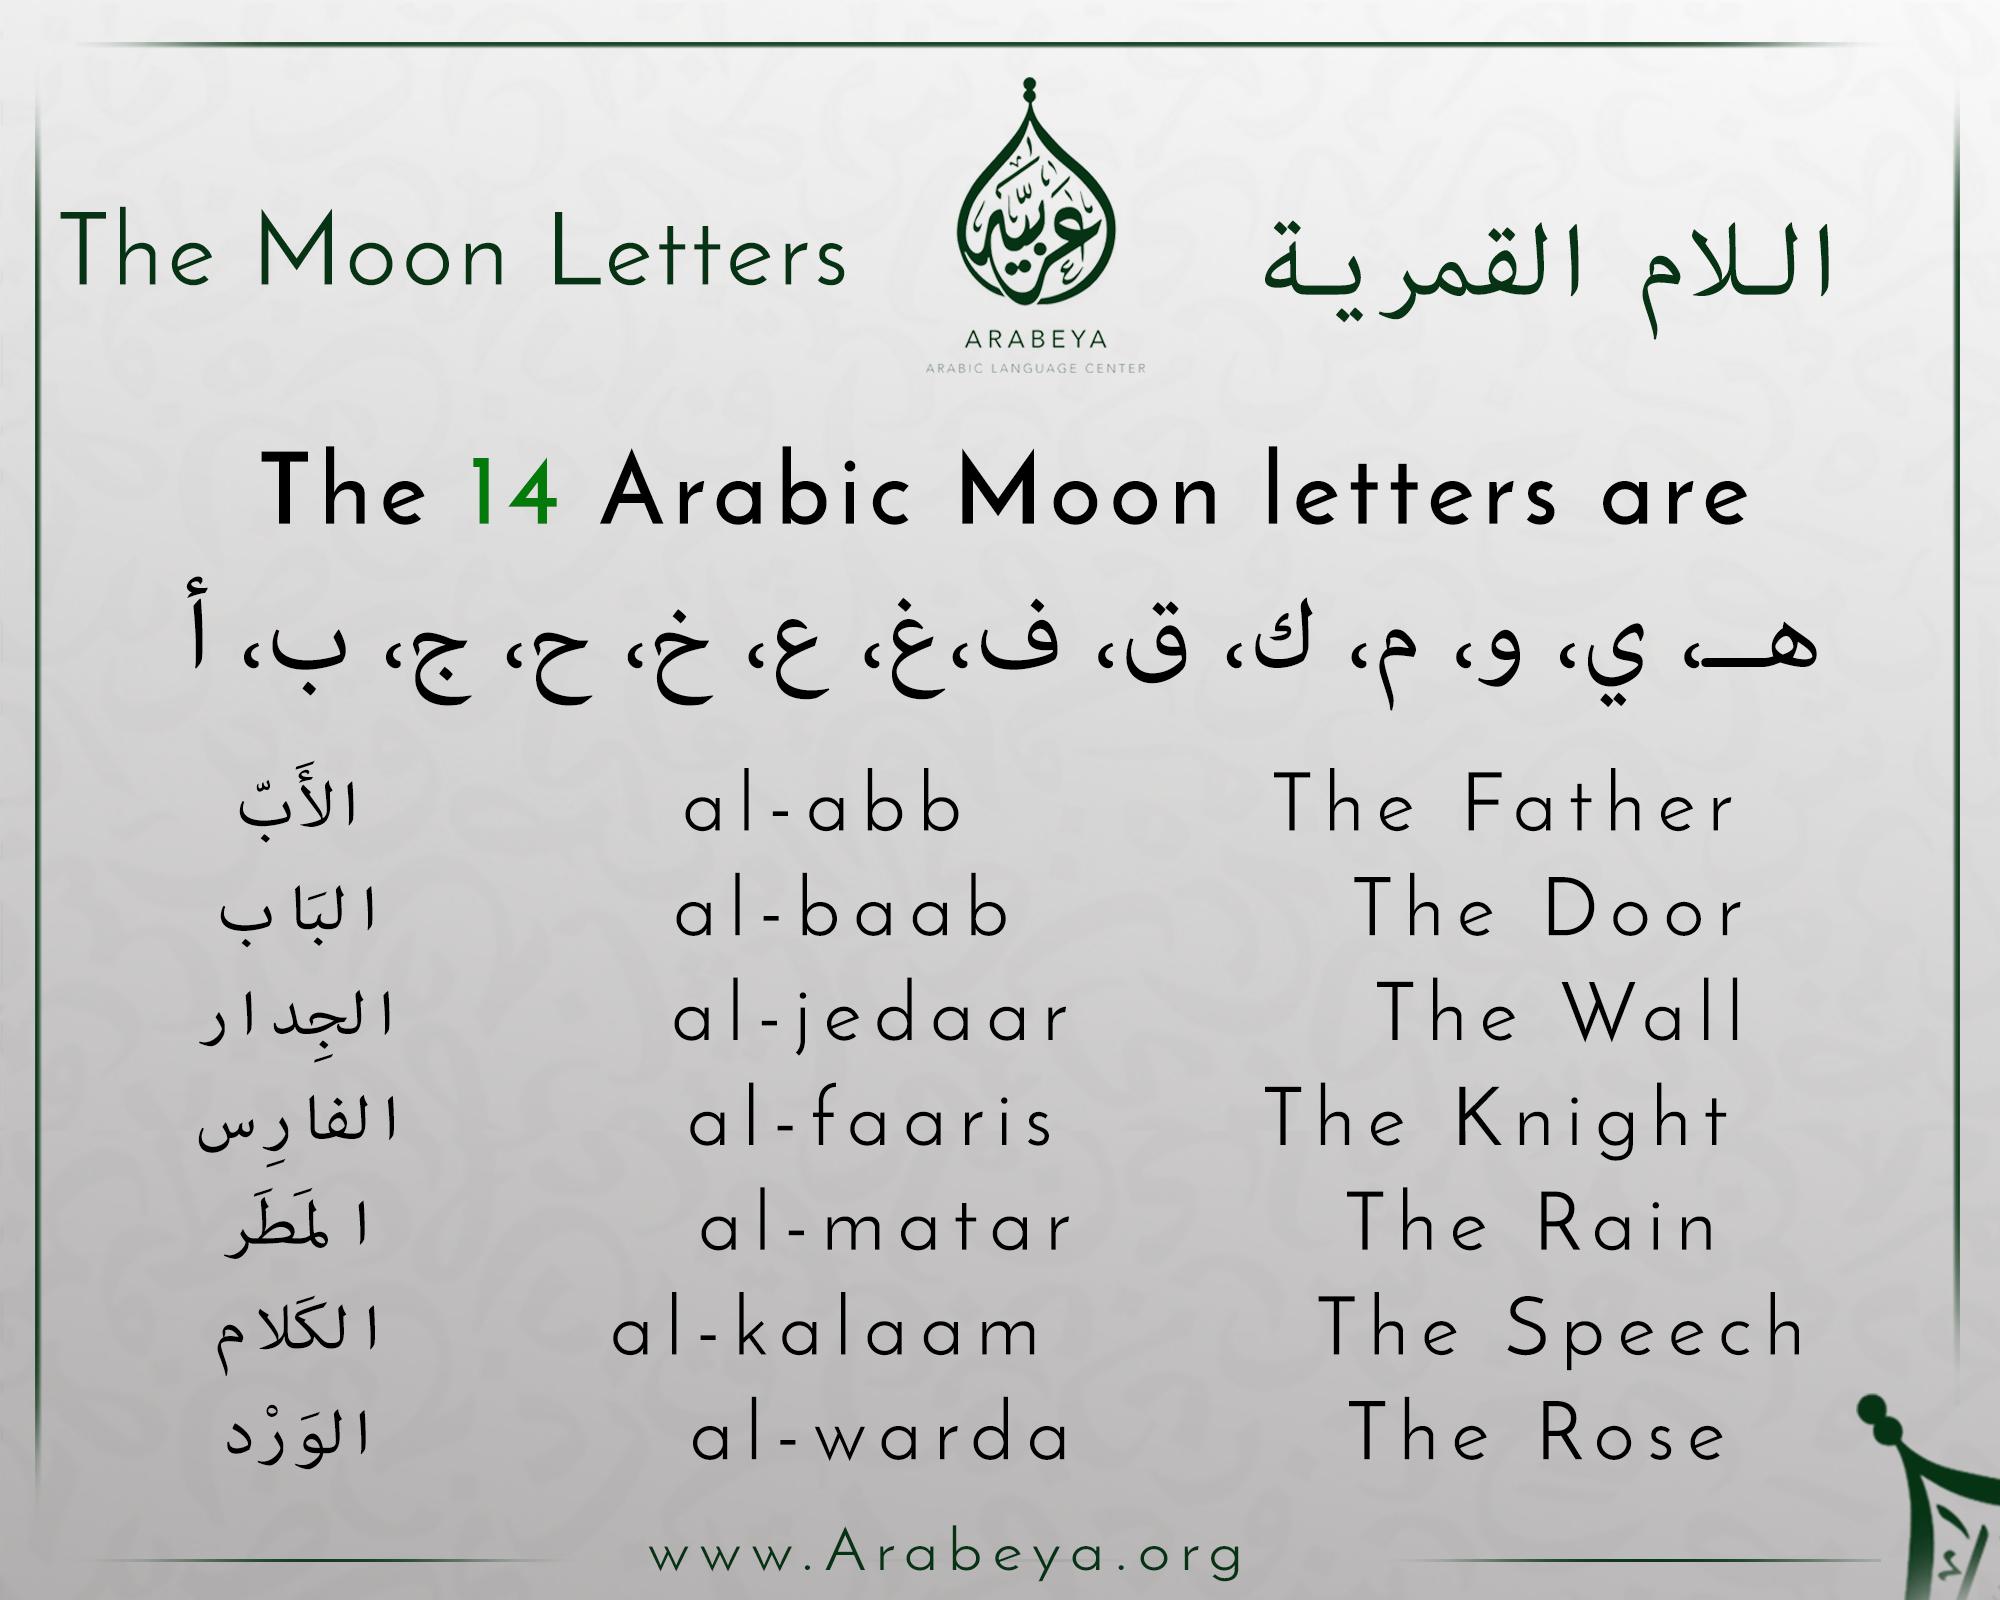 Pin By Arabeya Arabic Language Center On Modern Standard